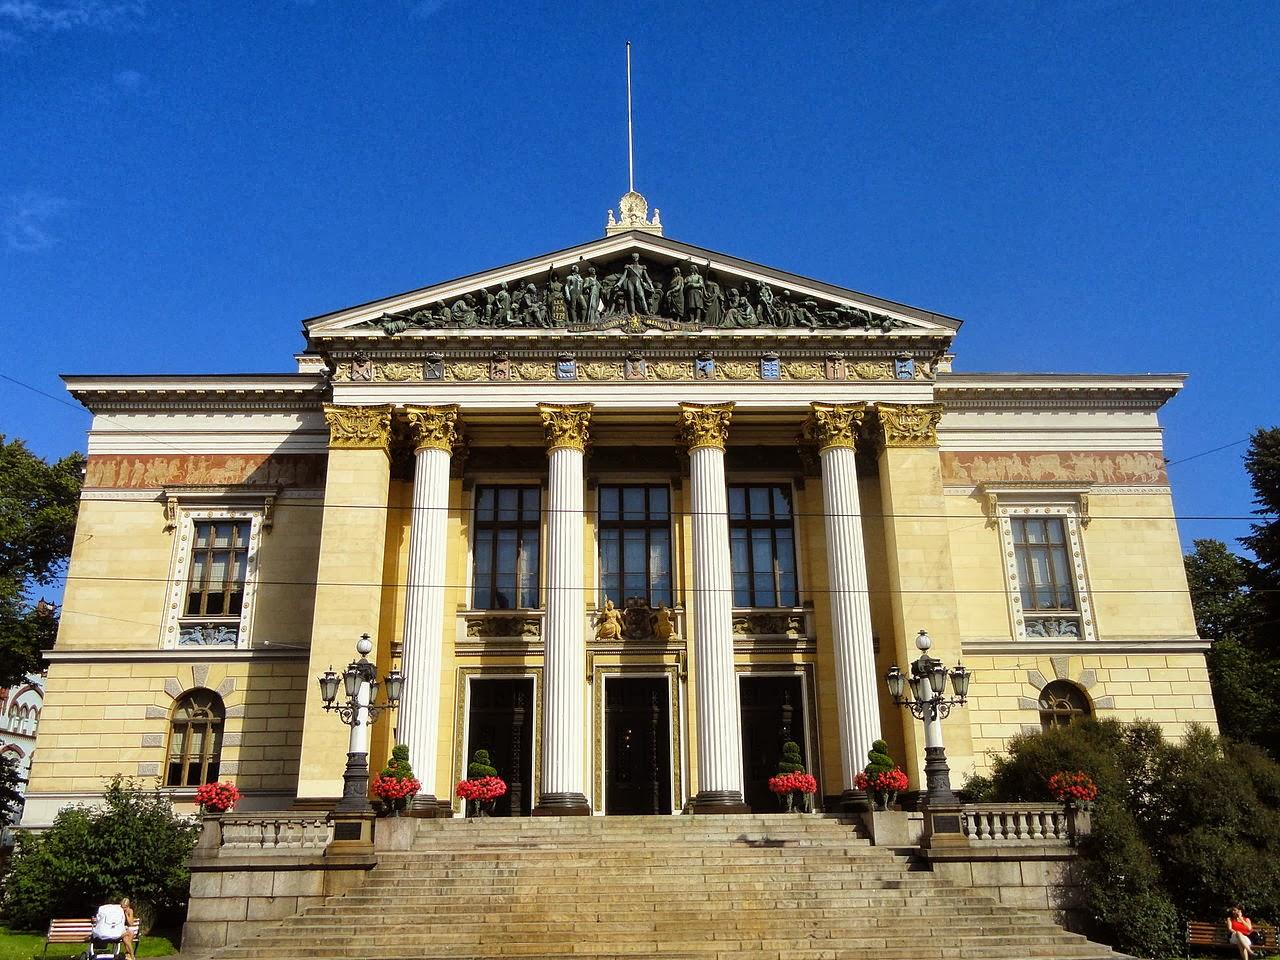 Photo: ヘルシンキ、House of the Estates By Daderot via Wikimedia Commons (CC0 1.0) http://goo.gl/JGjaQu  『テレフォン』 http://inagara.octsky.net/telefon